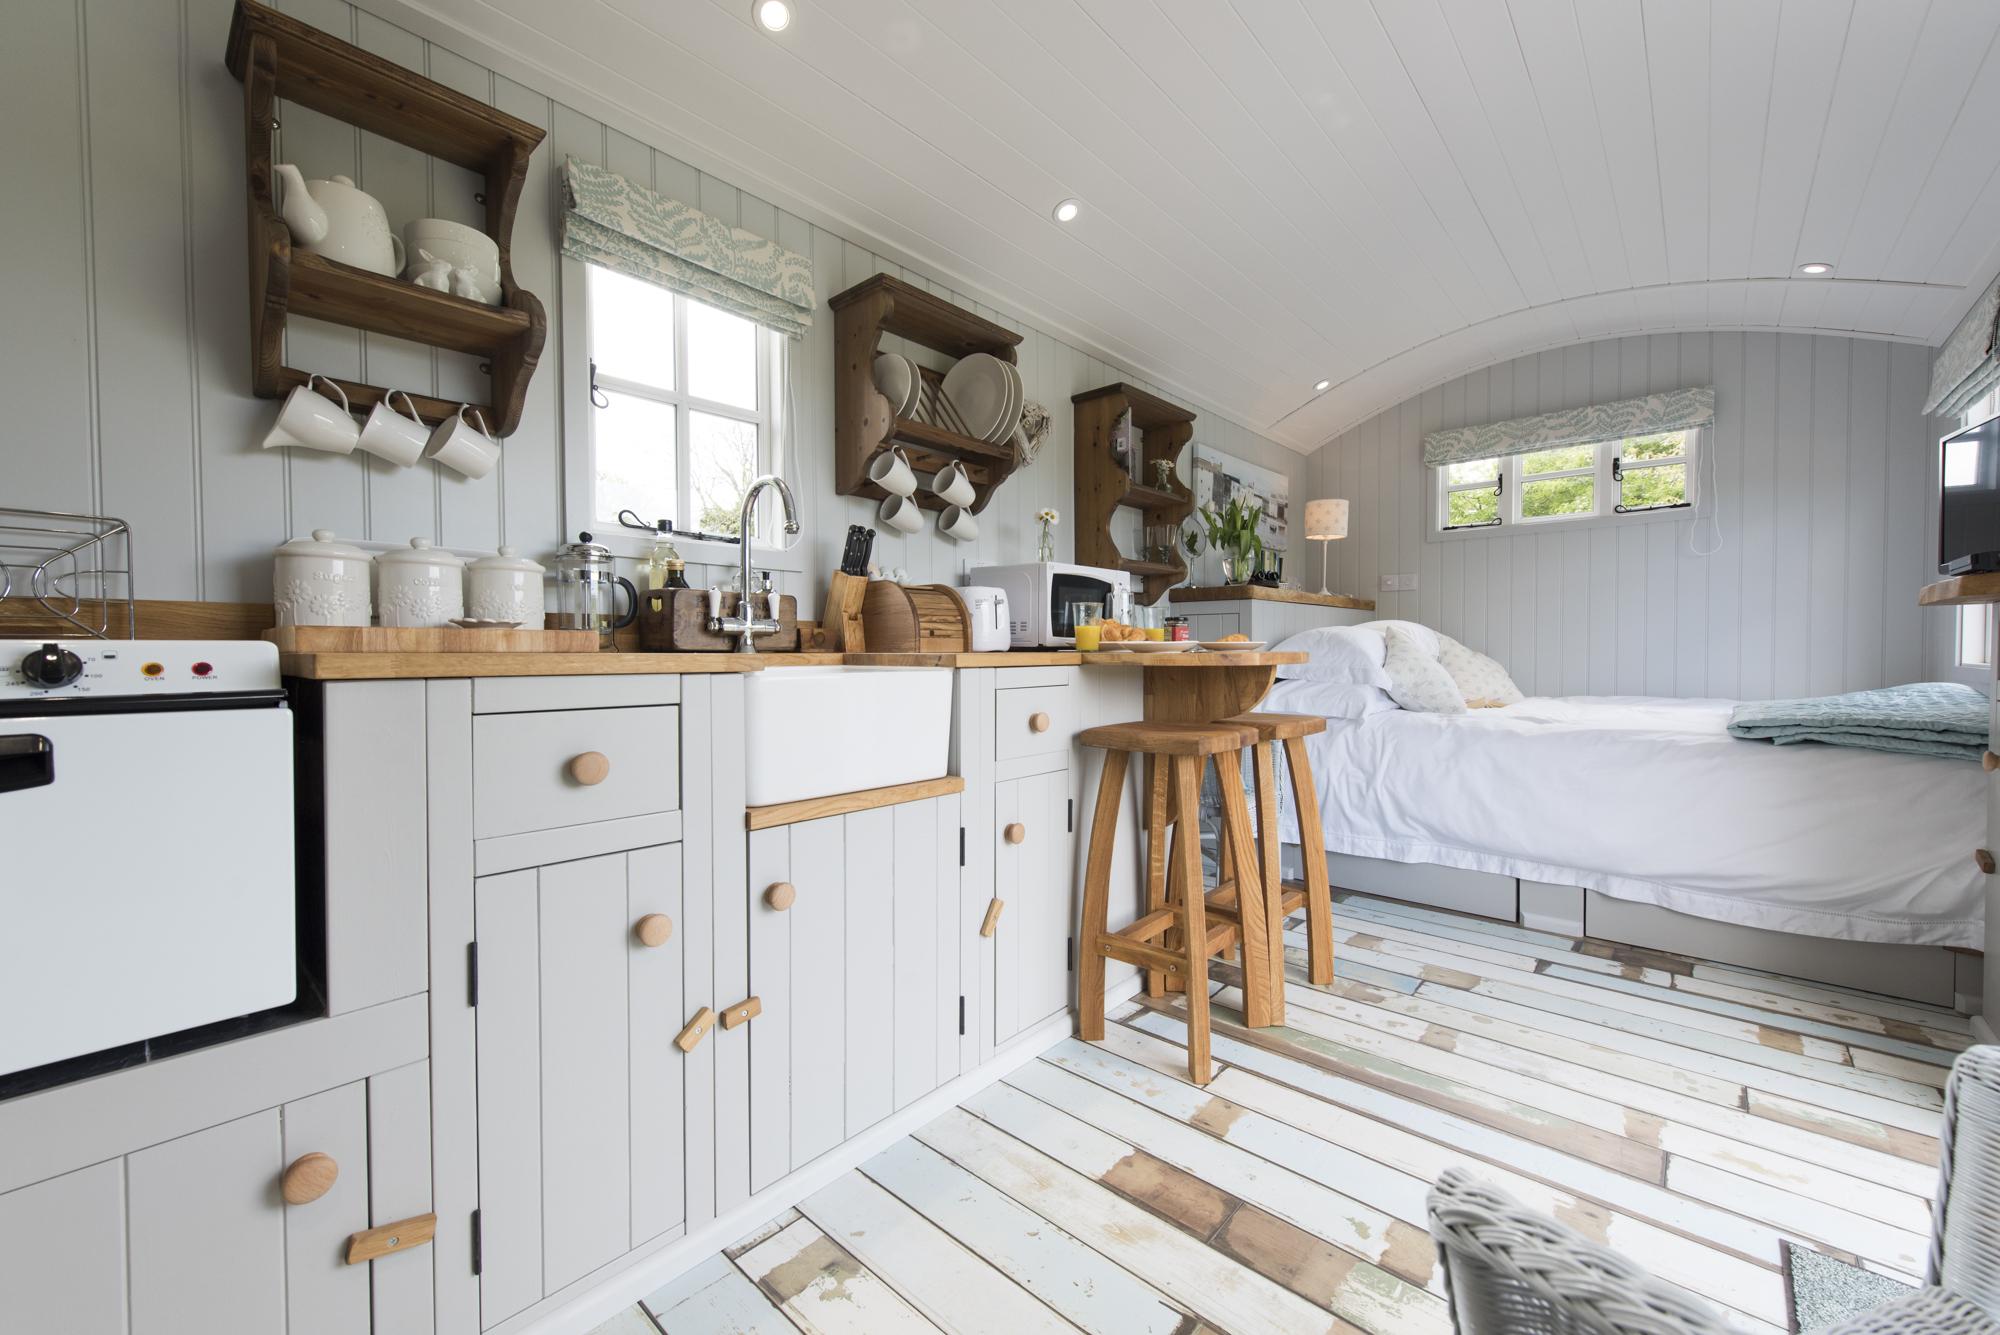 An Ashwood Shepherds Hut